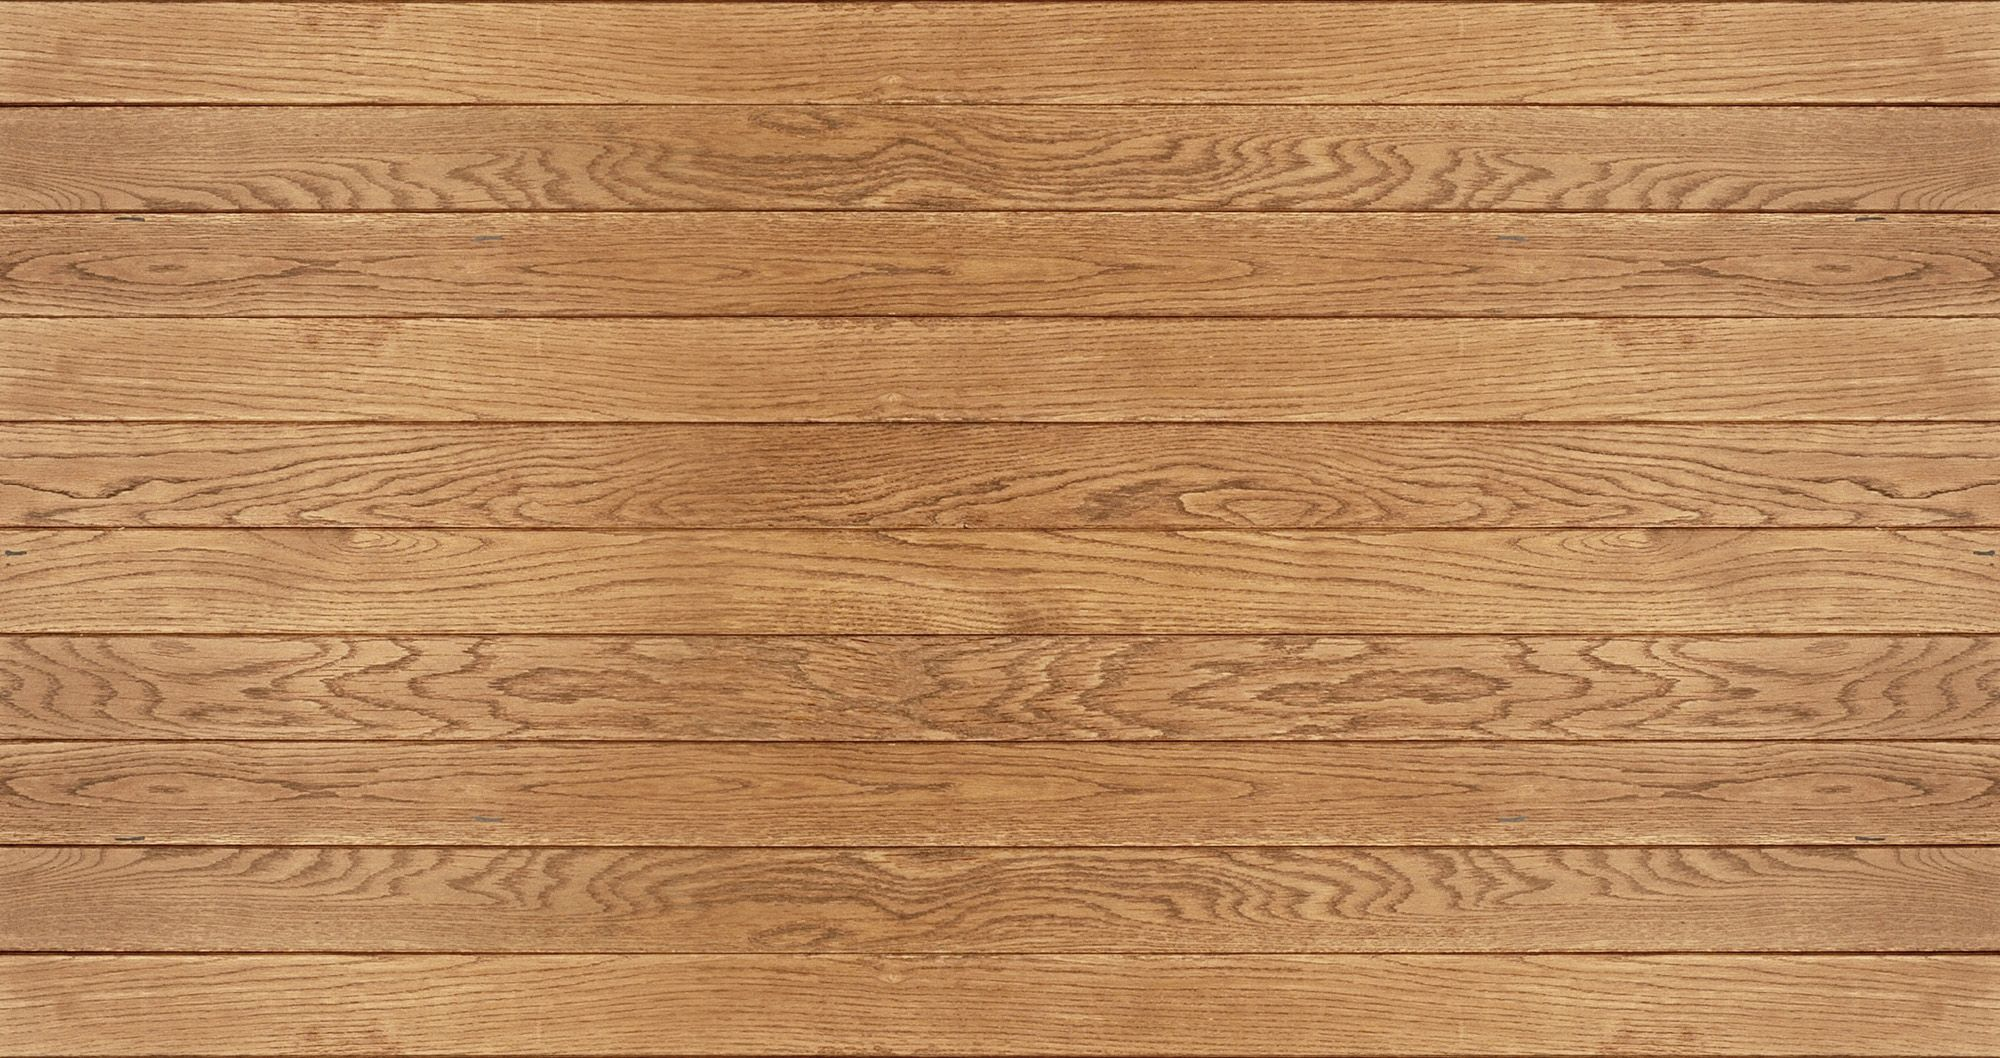 Light Wood Plank Textureallaboutbeauty21